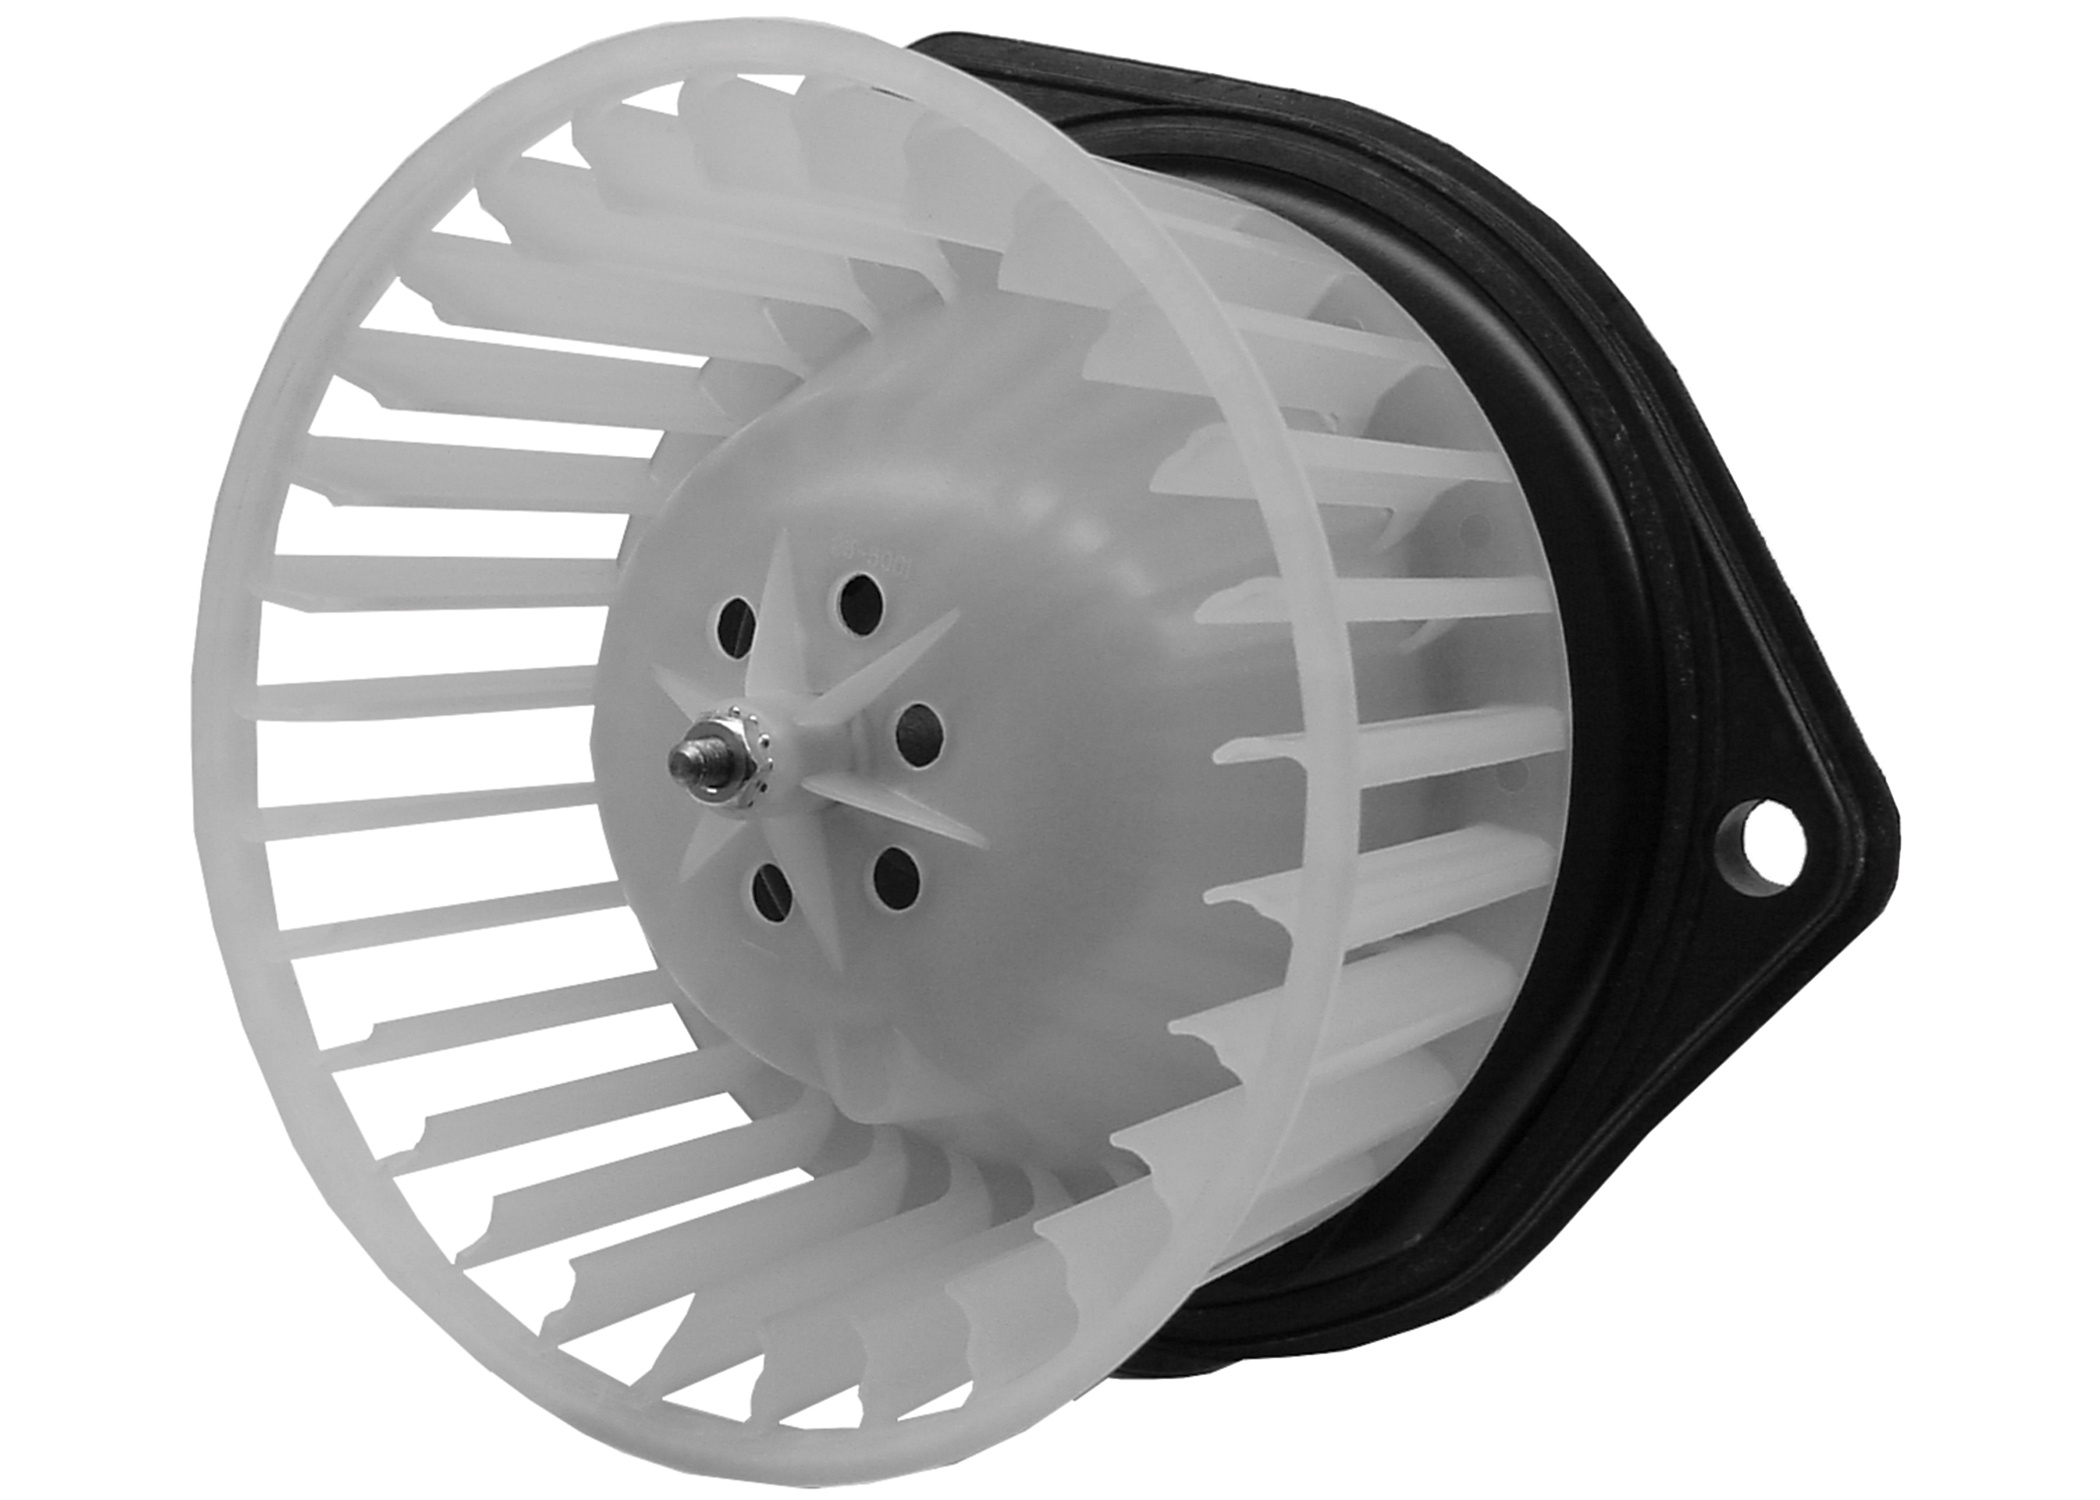 ACDELCO GM ORIGINAL EQUIPMENT - HVAC Blower Motor and Wheel - DCB 15-8544